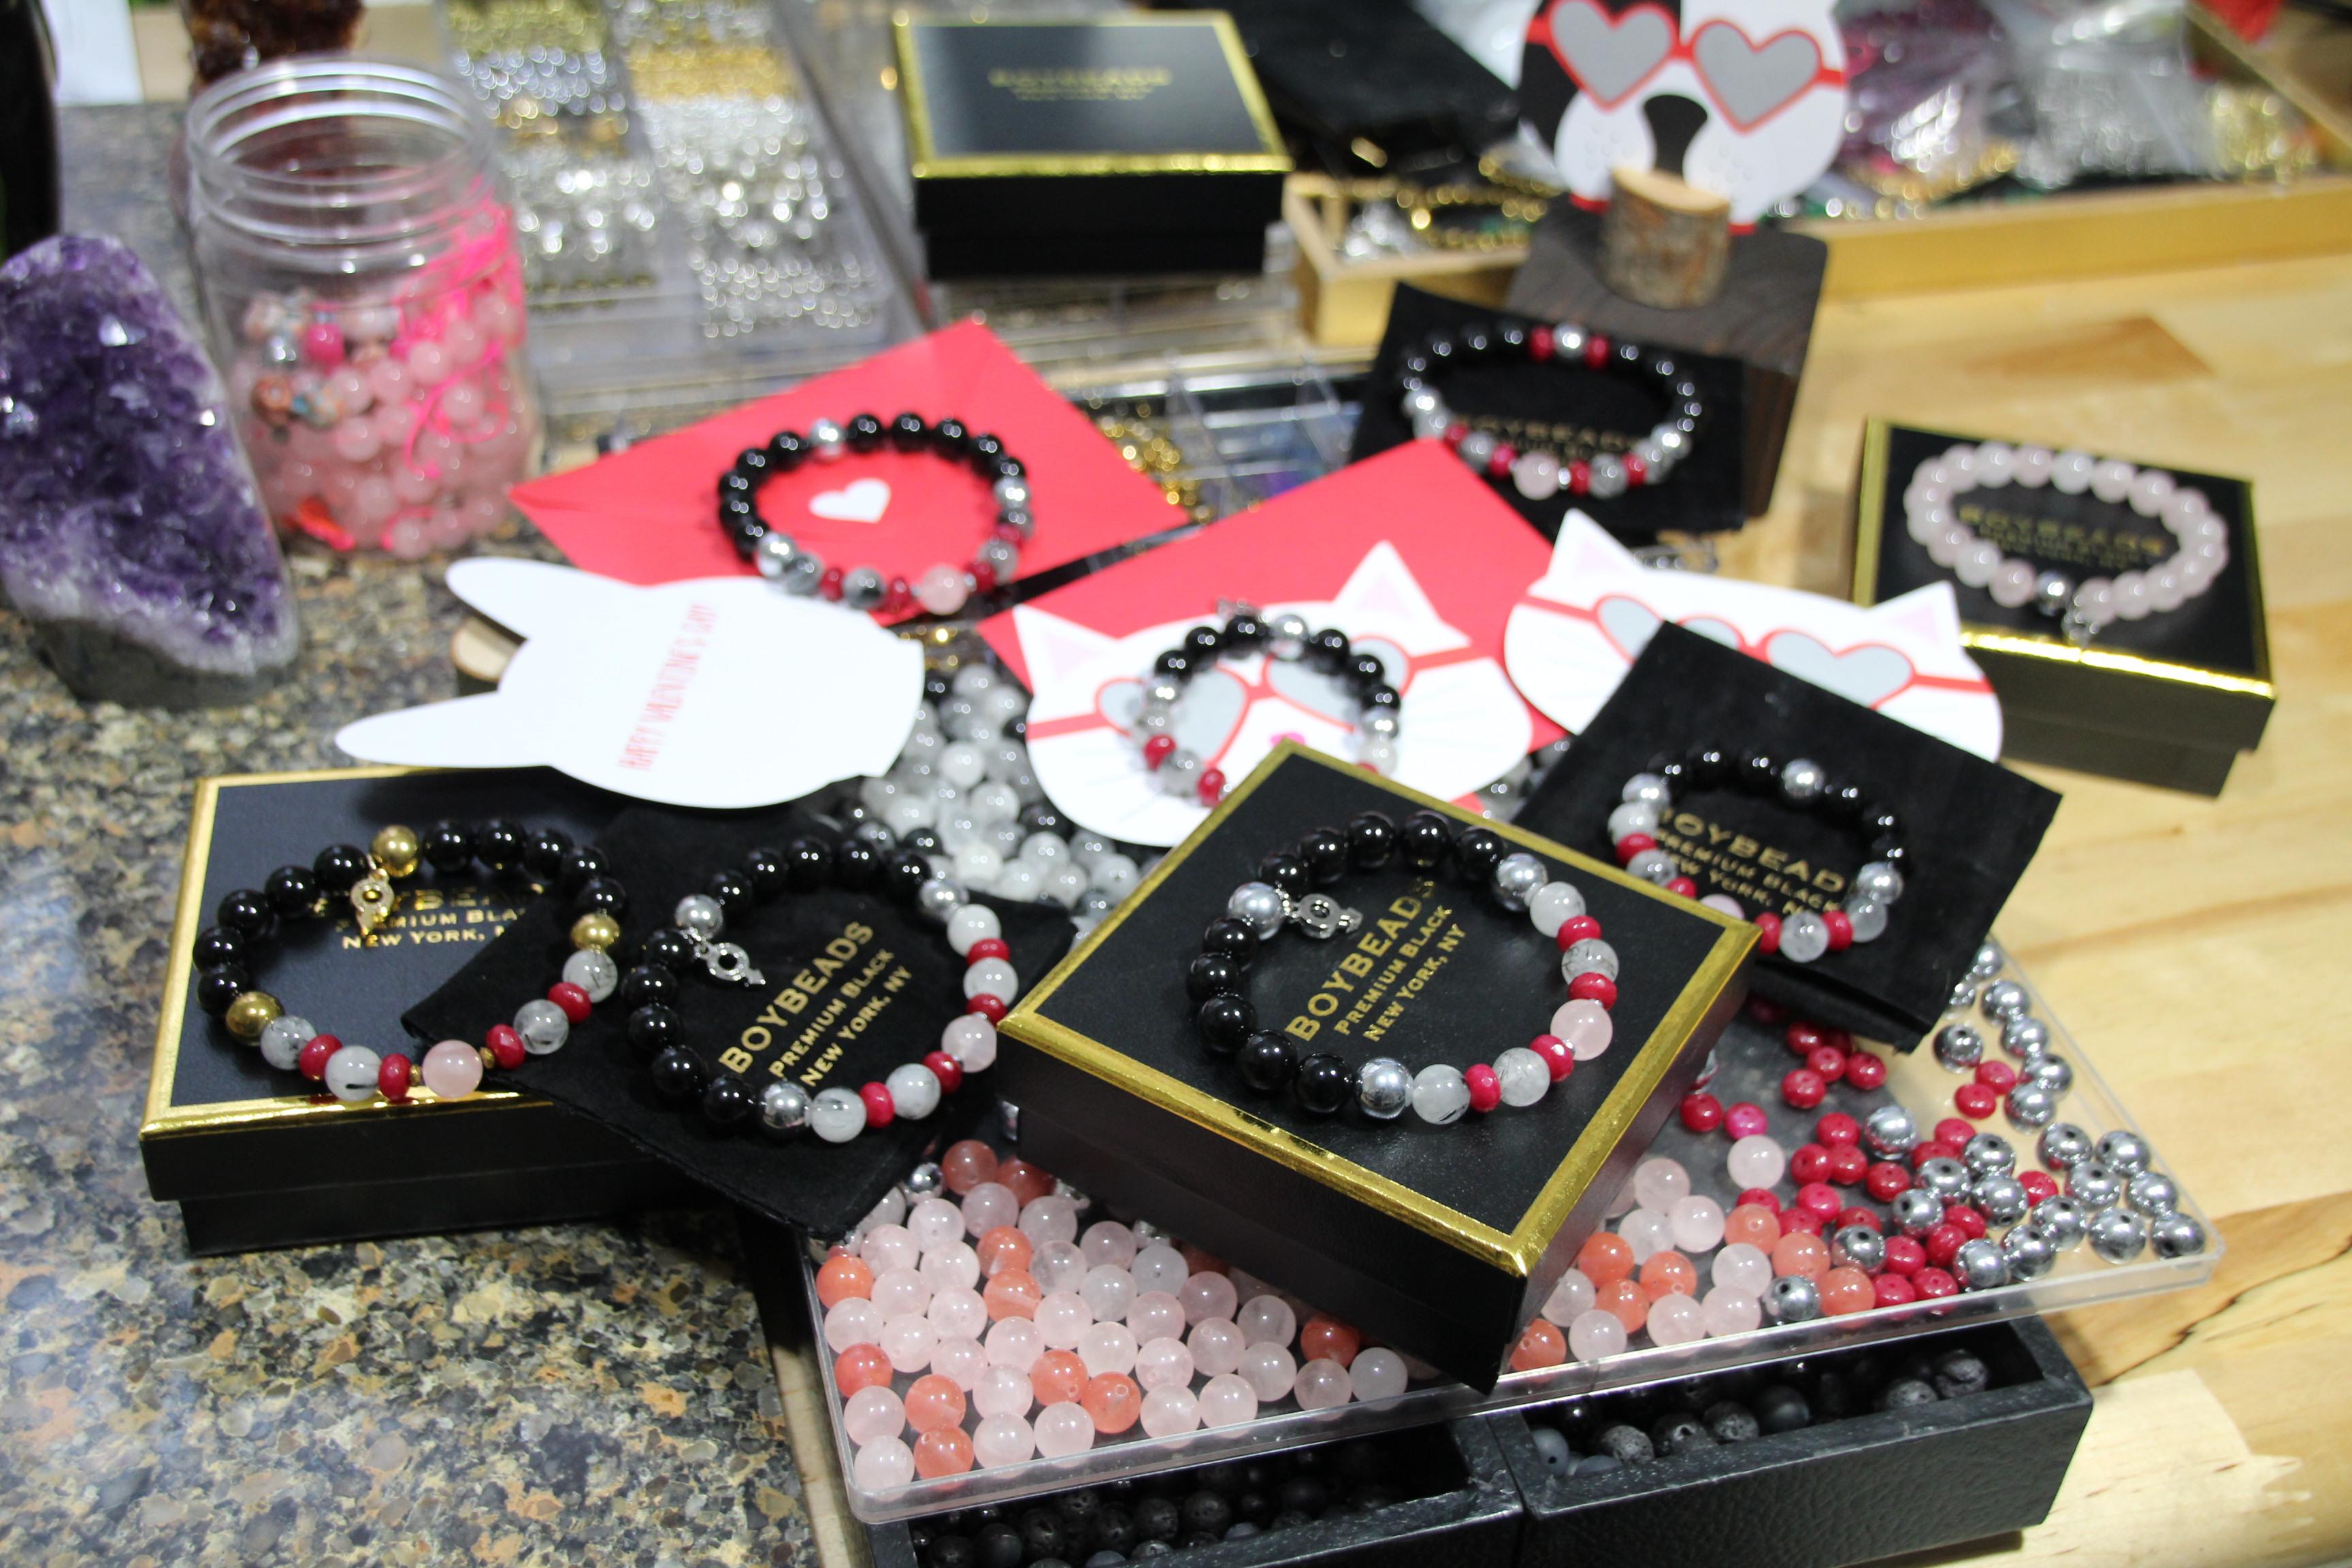 -apollo-boybeads-tourmaline-black-onyx-hematite-beaded-wristband-bracelet-for-men-guys-boy-for-valentines-day-2019-gold138744.jpg